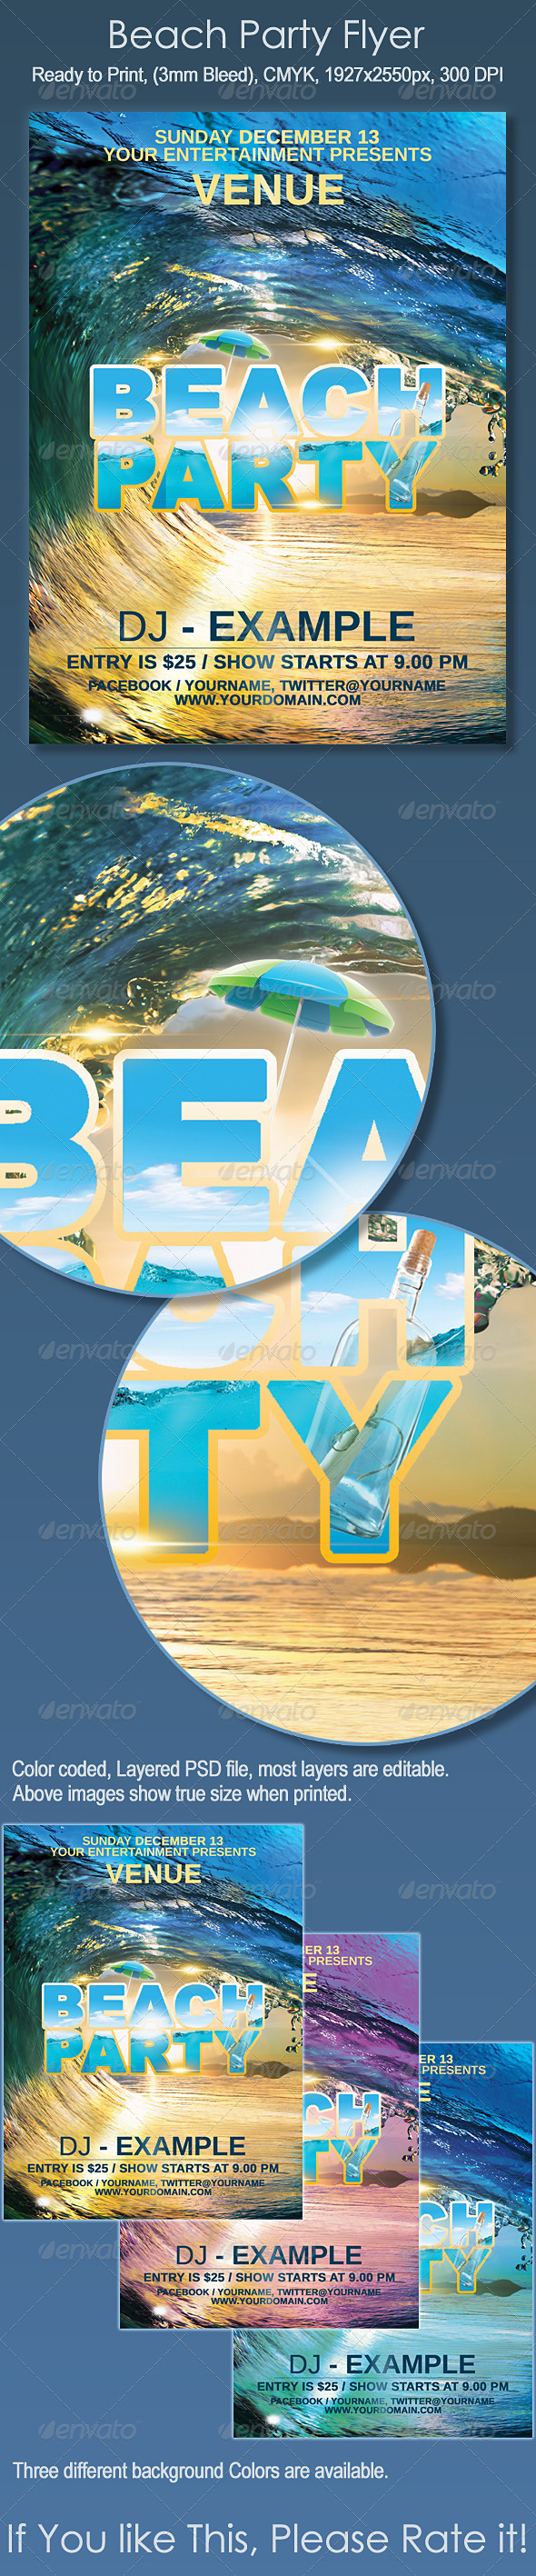 Beach Party Flyer - Print Templates